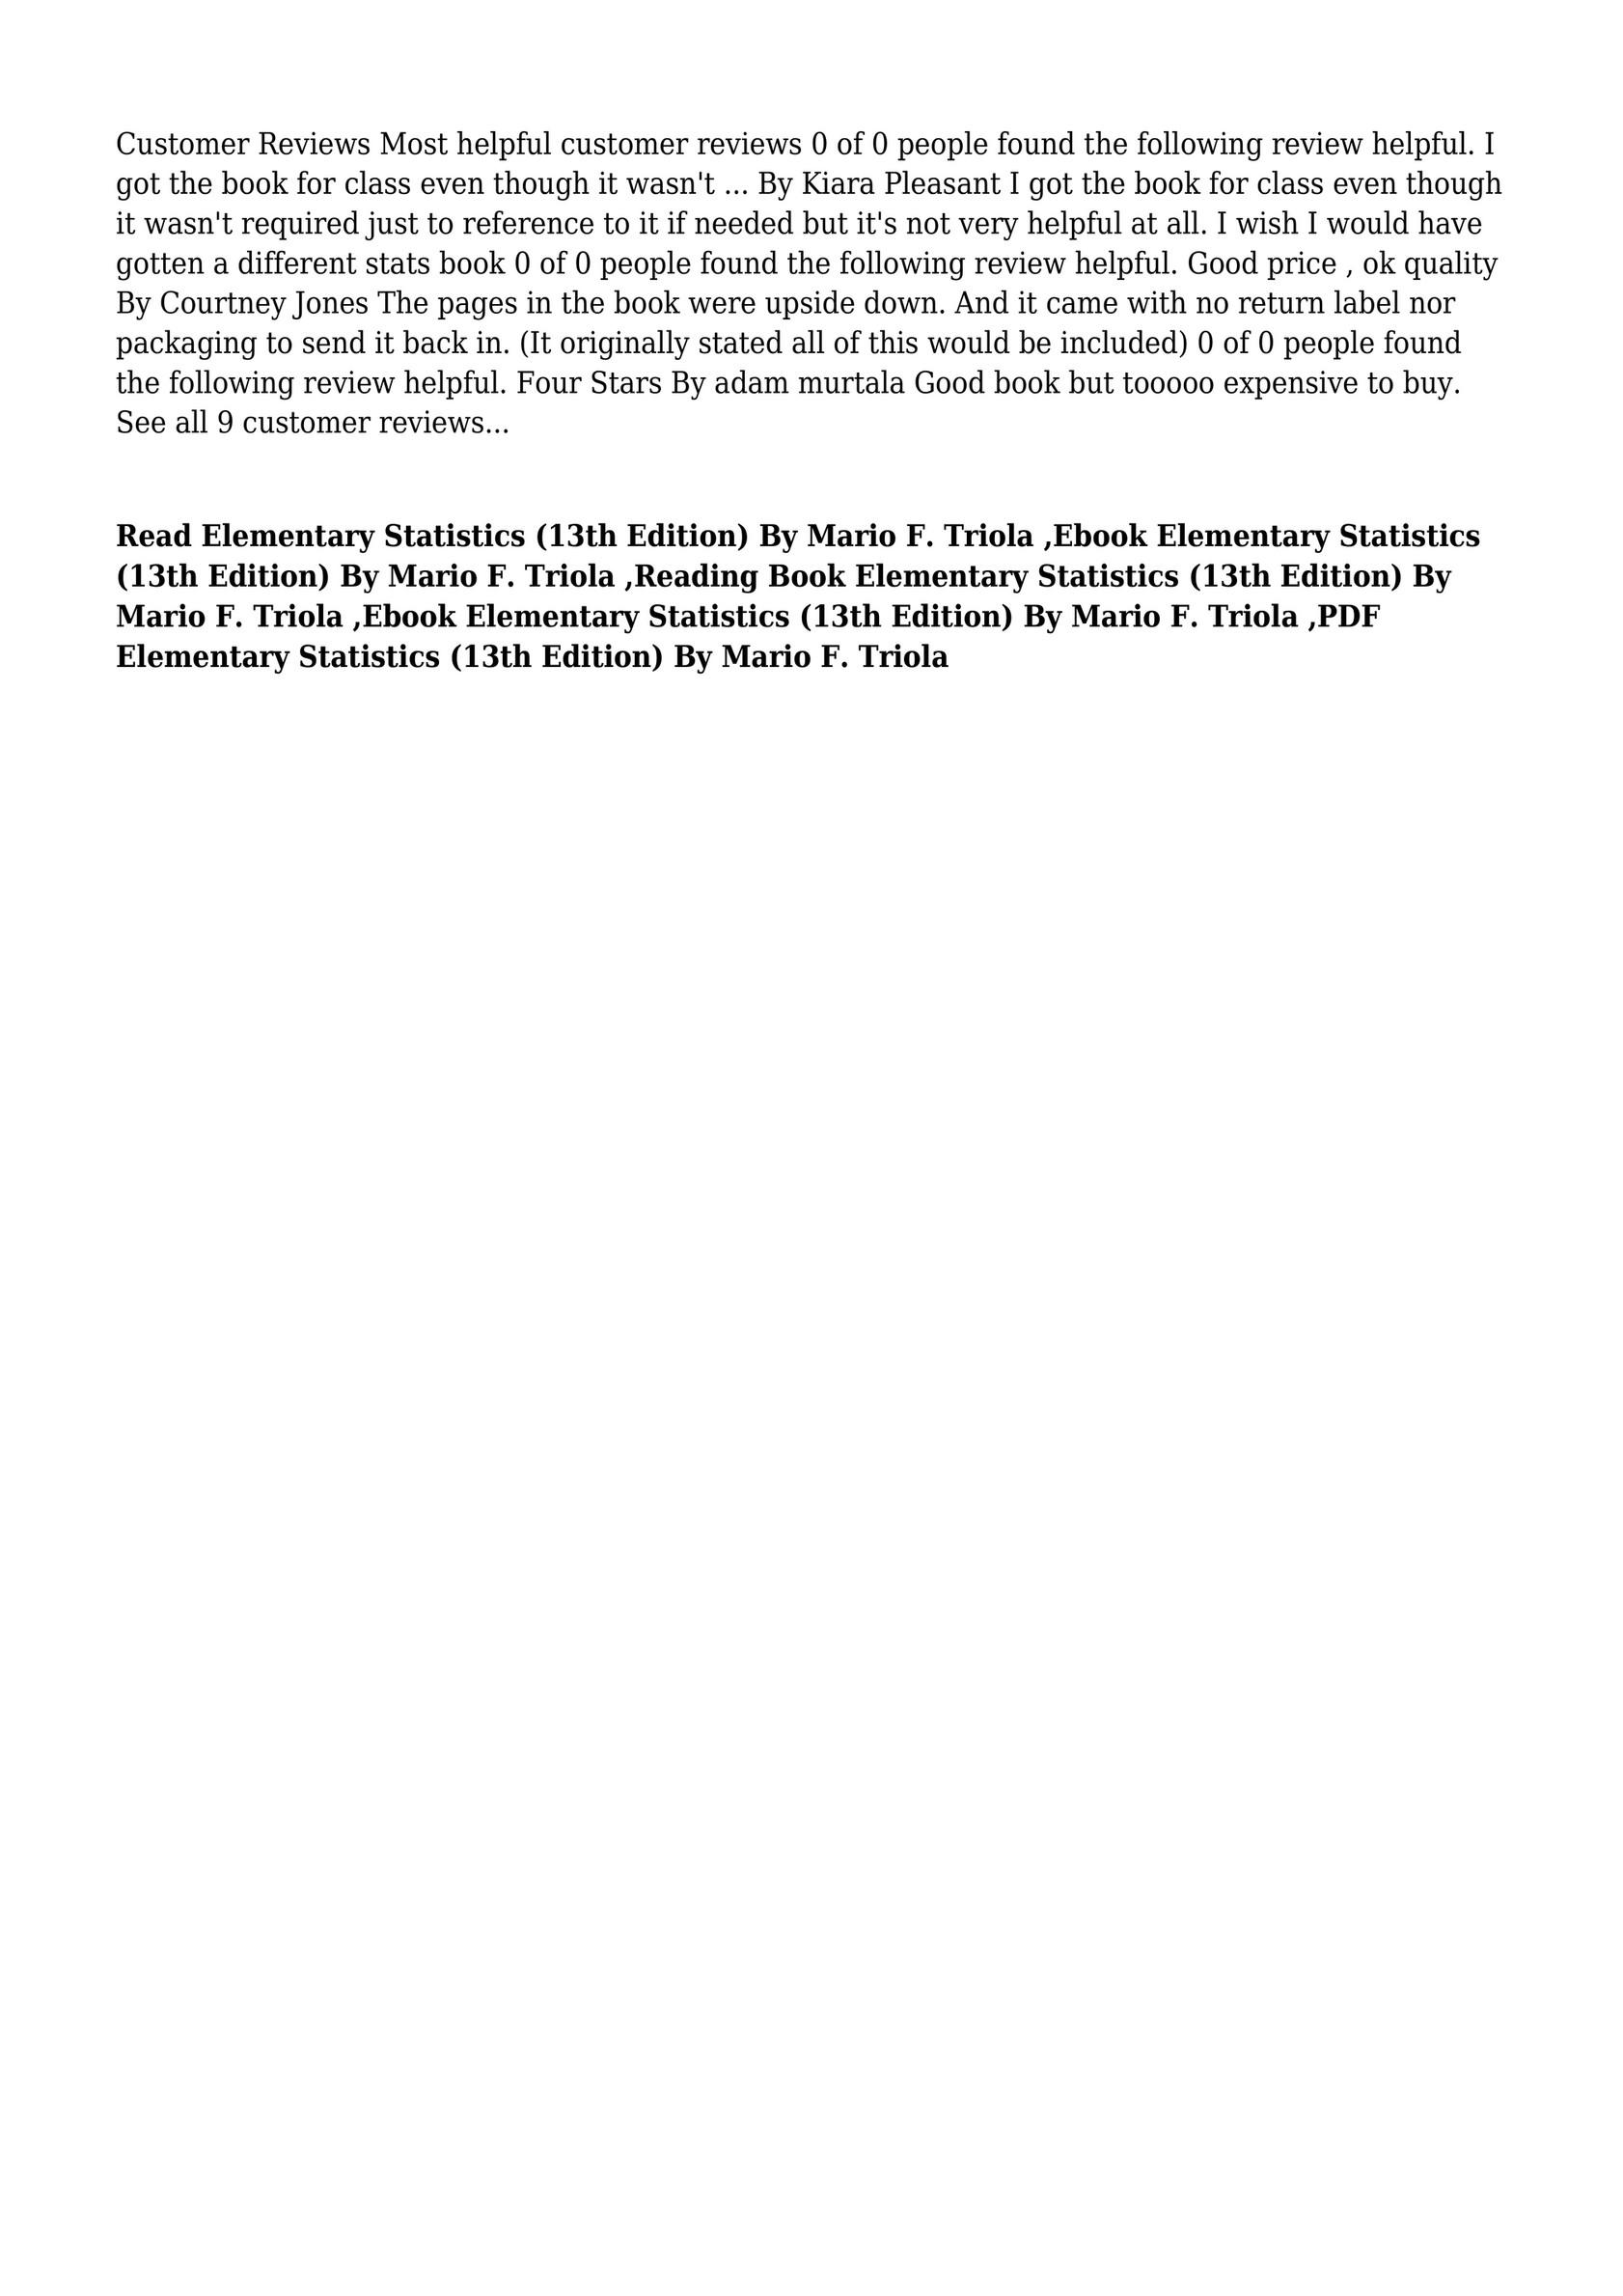 Elementary Statistics Mario Triola 13th Edition Pdf